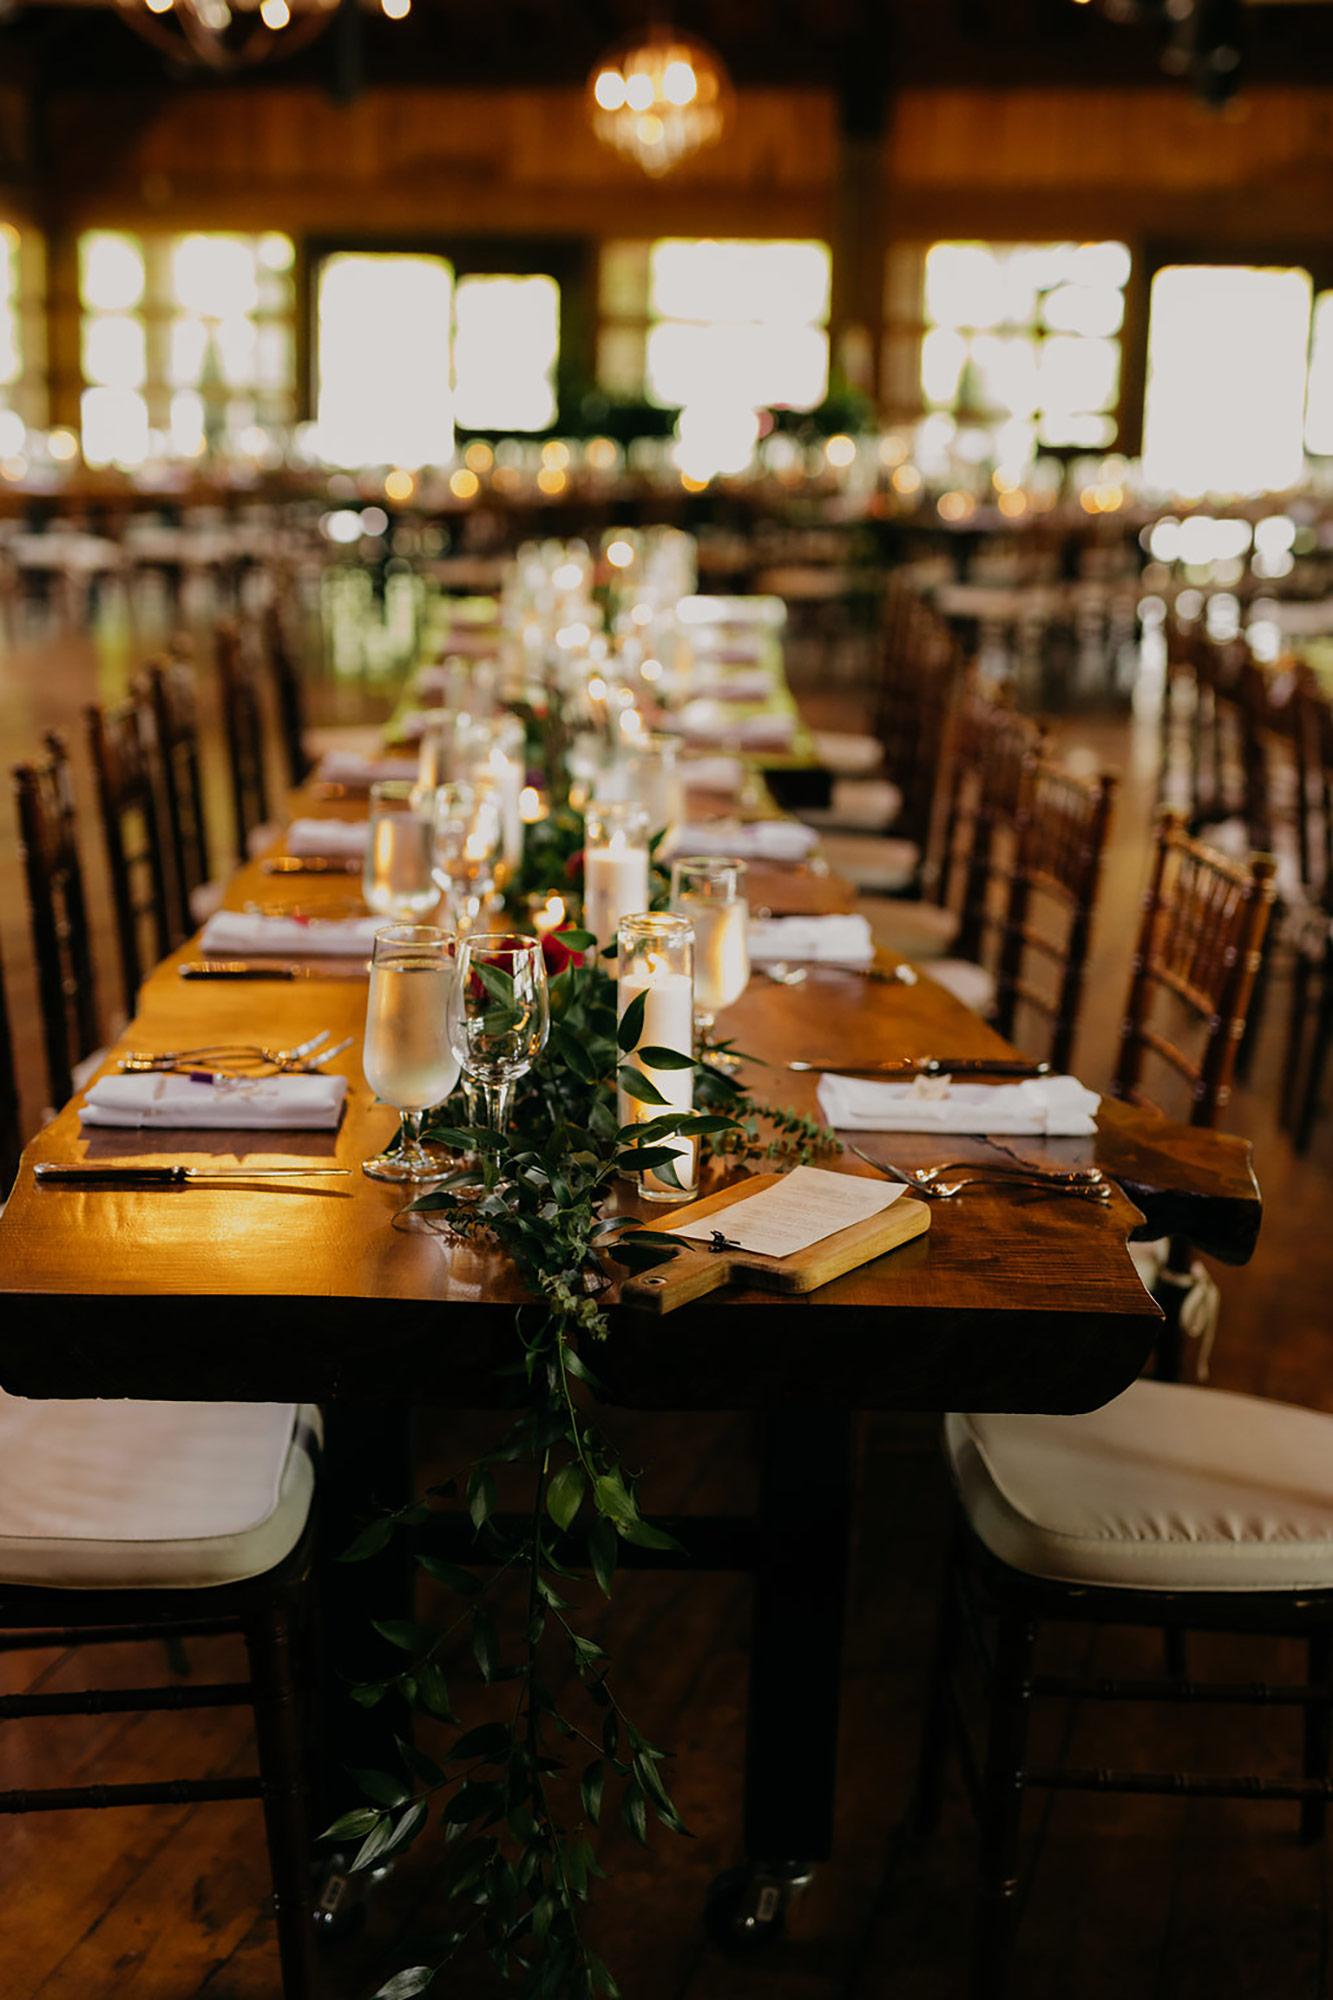 Kurtz-Orchards-Wedding-Niagara-wedding-Vineyard-Bride-Photography-by-Kayla-Rocca-041.JPG